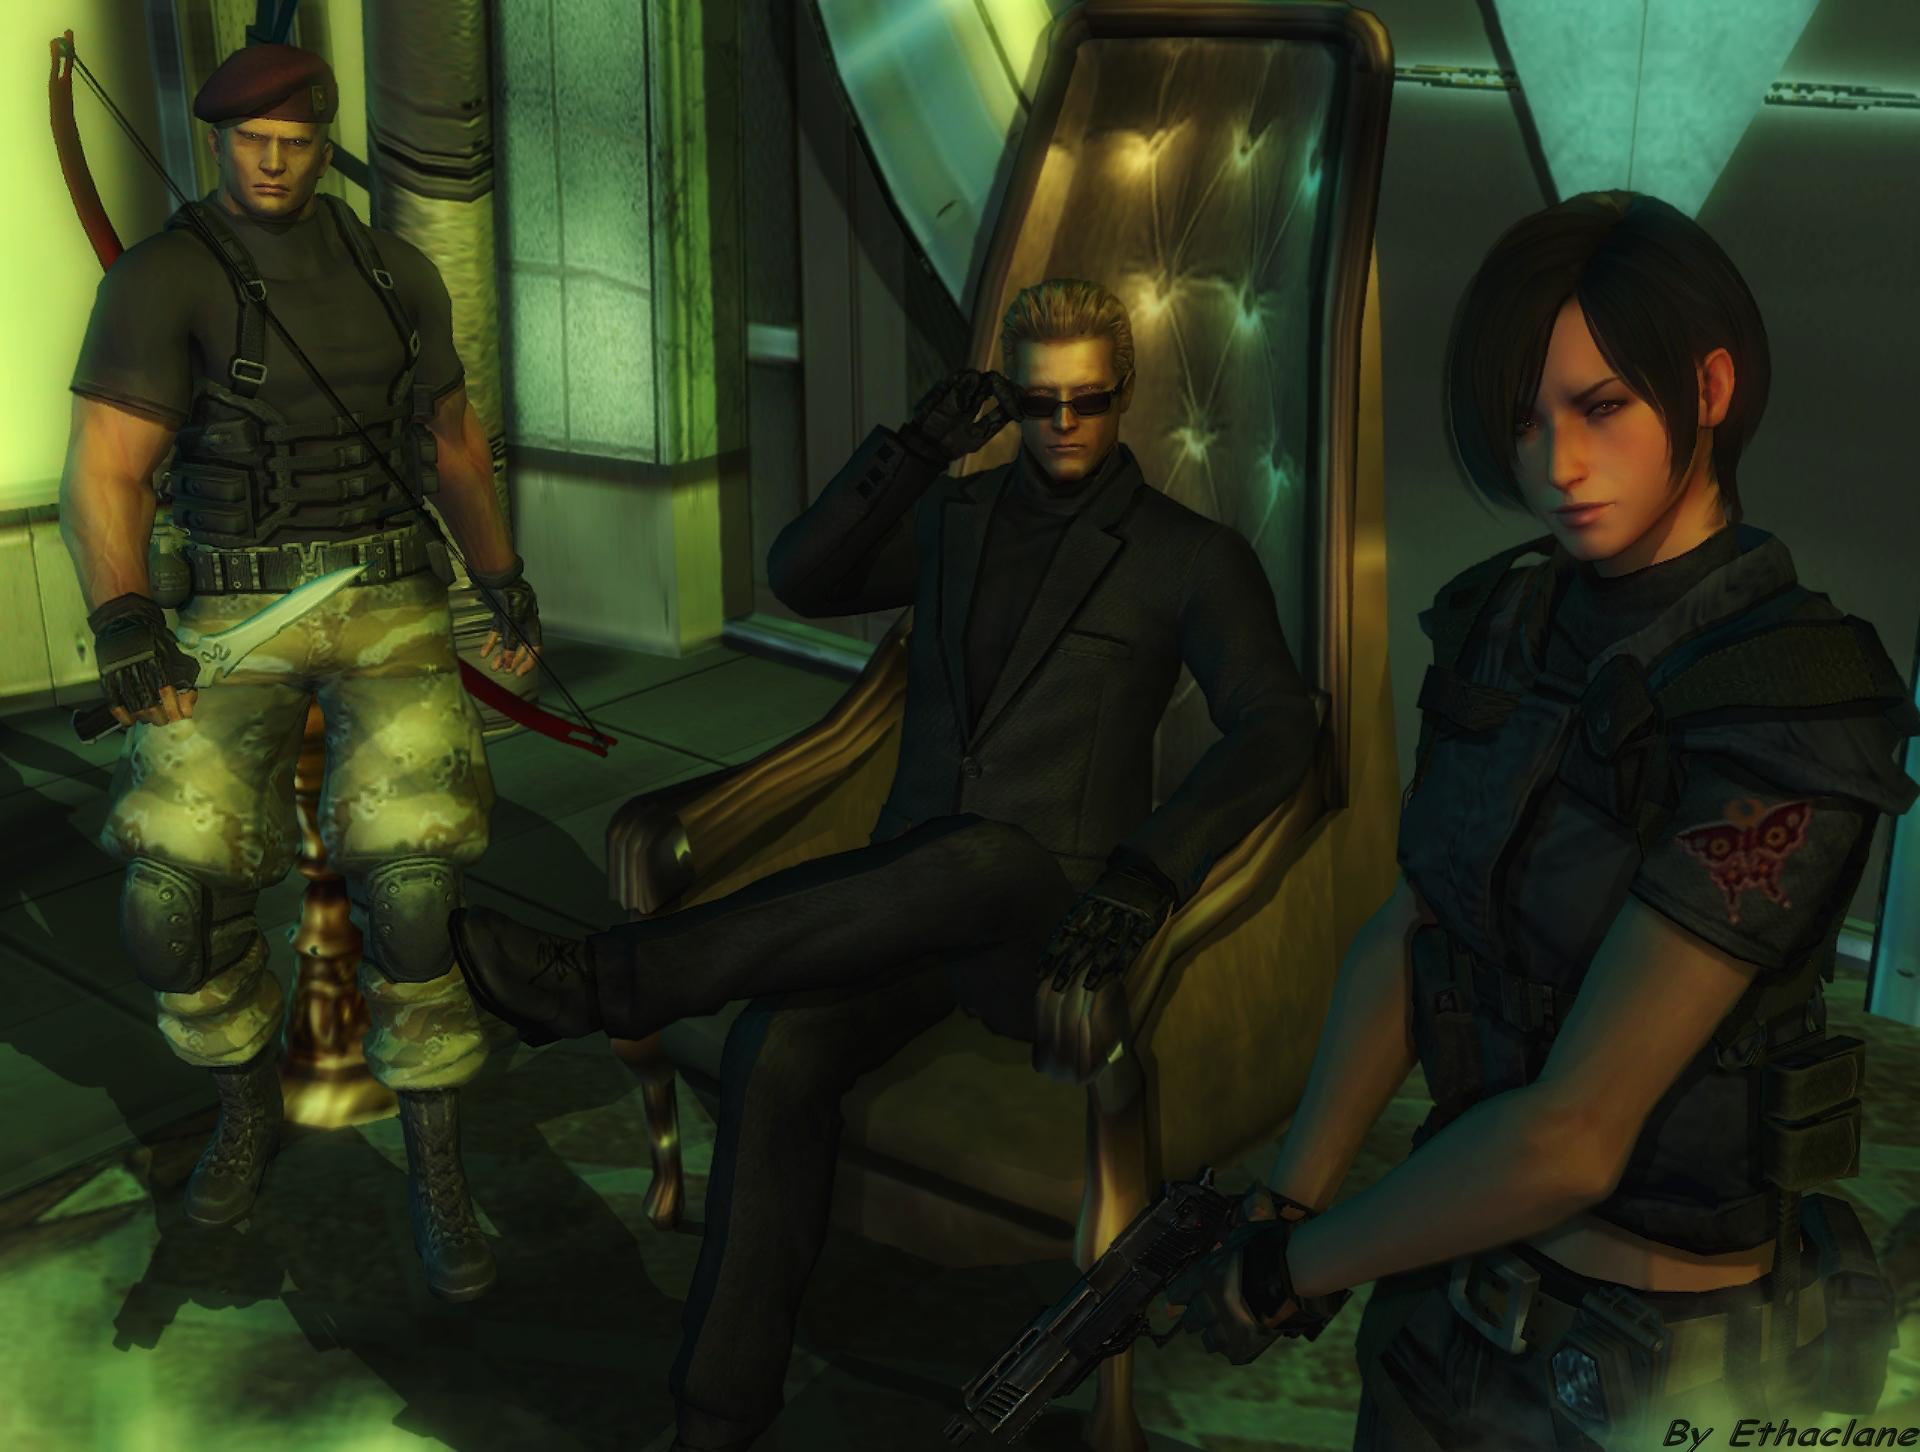 Resident evil wallpaper - Ada/Wesker/Krauser by ethaclane